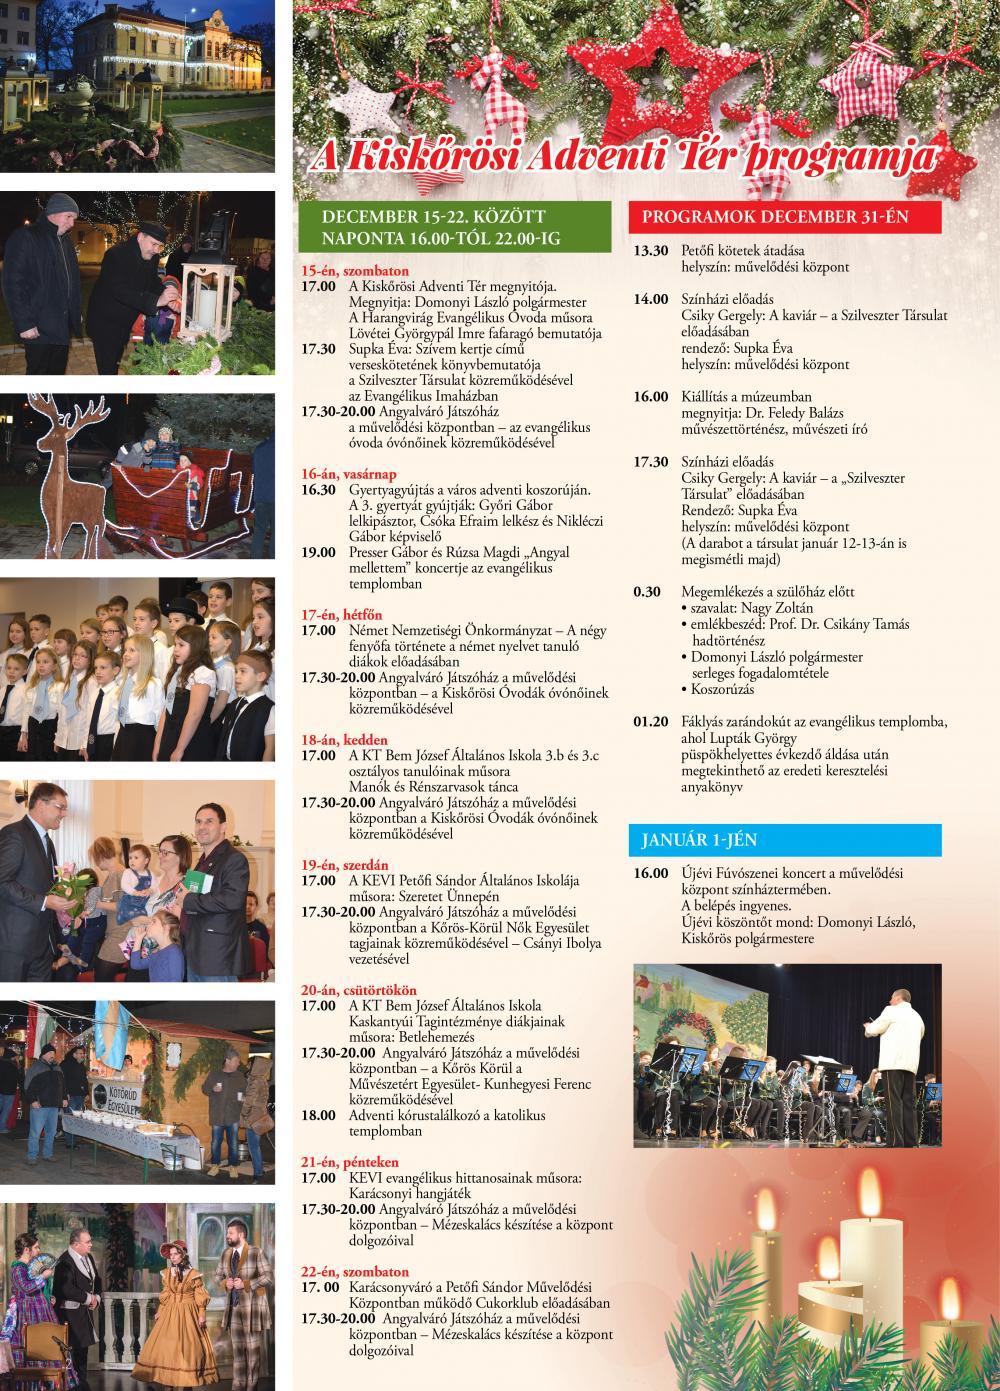 Kiskőrösi Adventi Tér programja